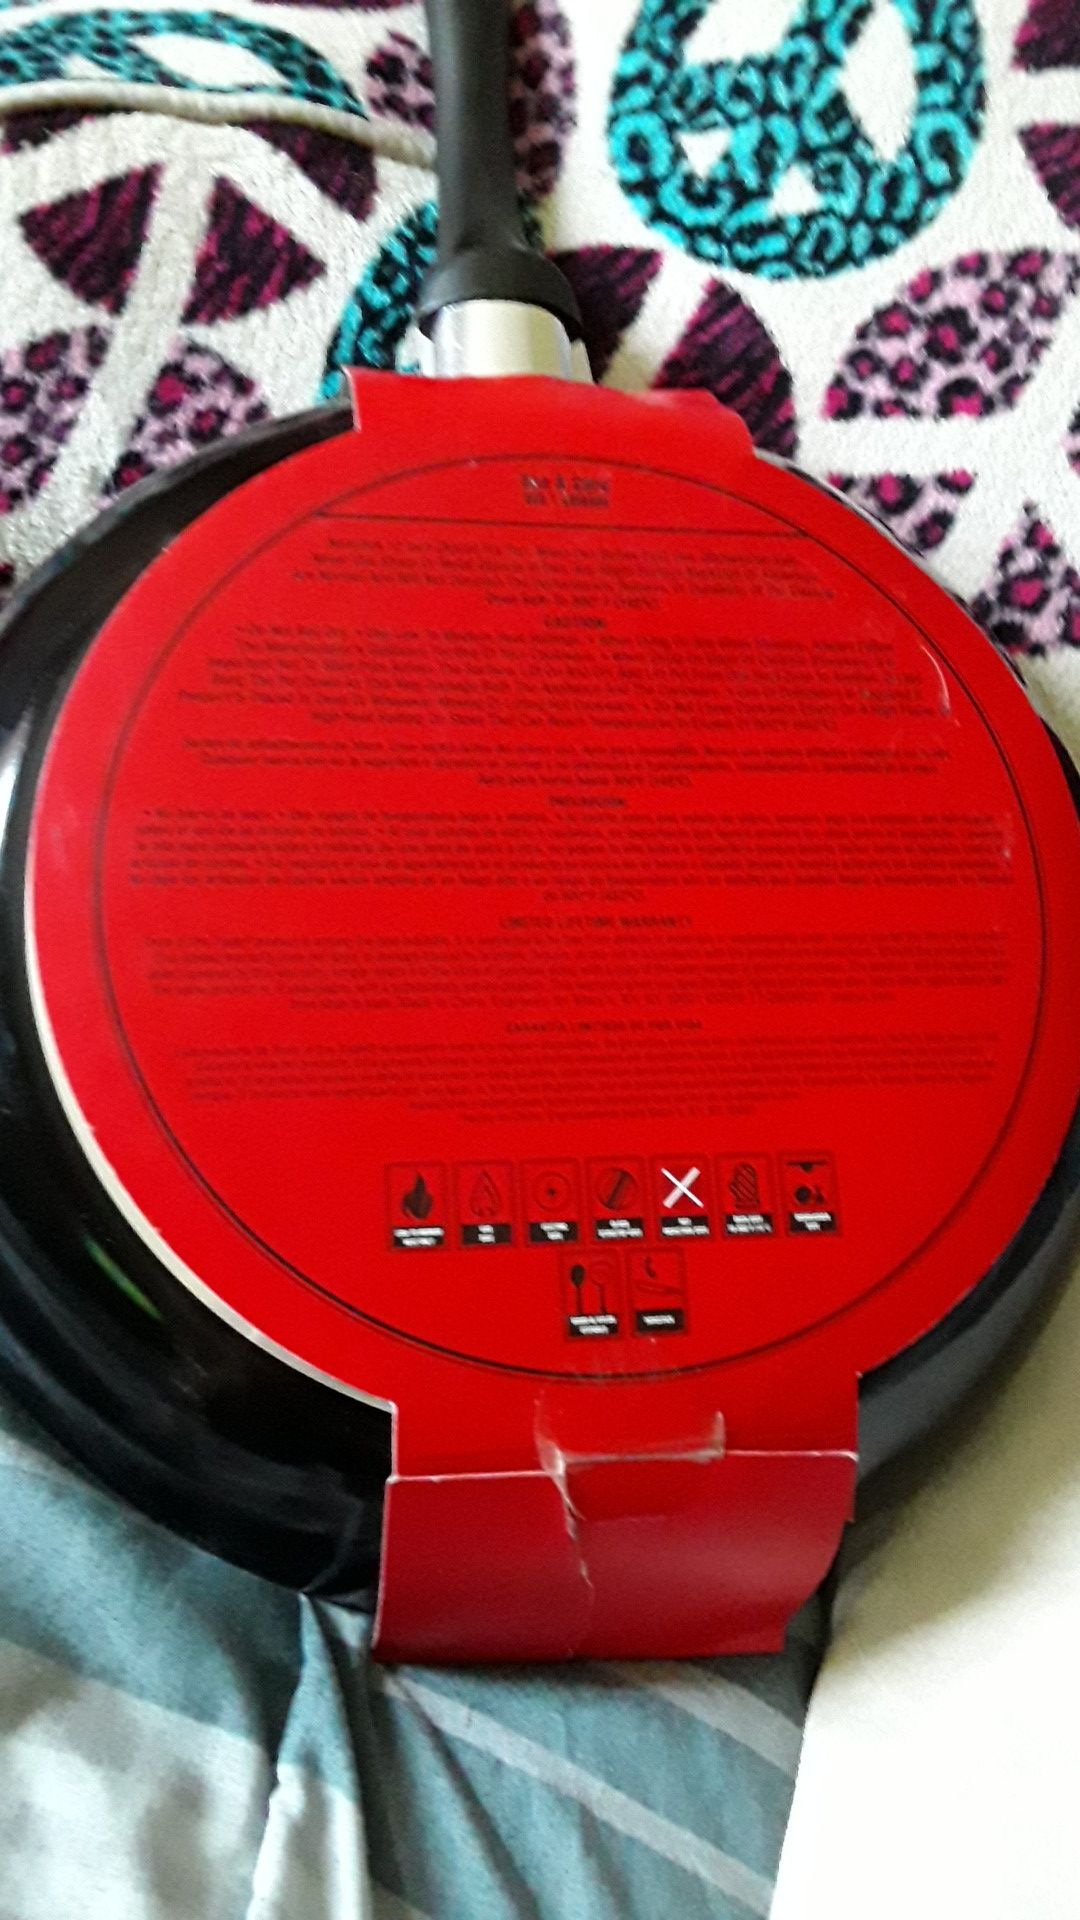 12 inch pan